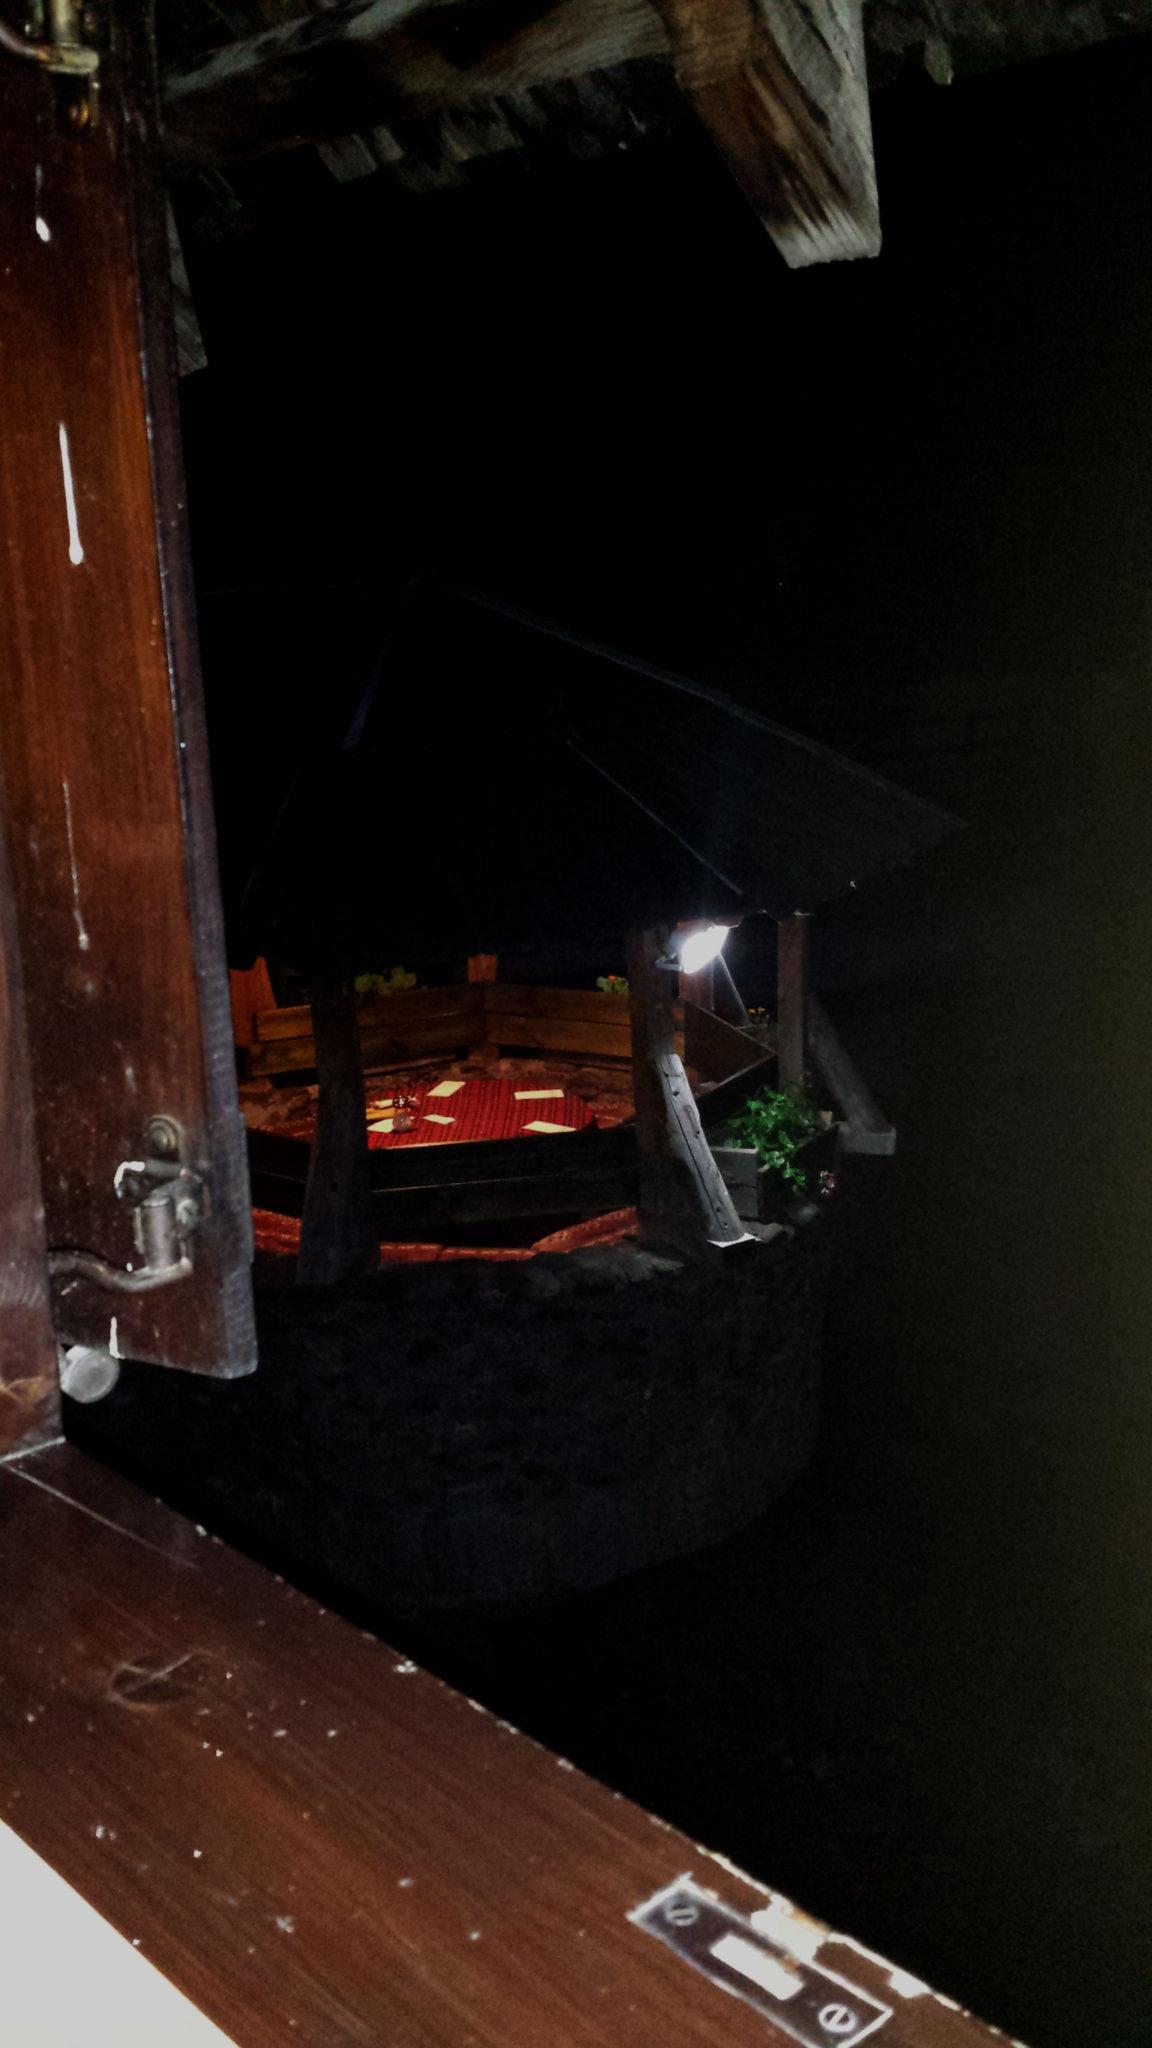 Hemaposesesvalises_travel_blog_bonnes_adresses_montenegro_kolasin_konoba_kod_rada_vlahovica_restaurant4